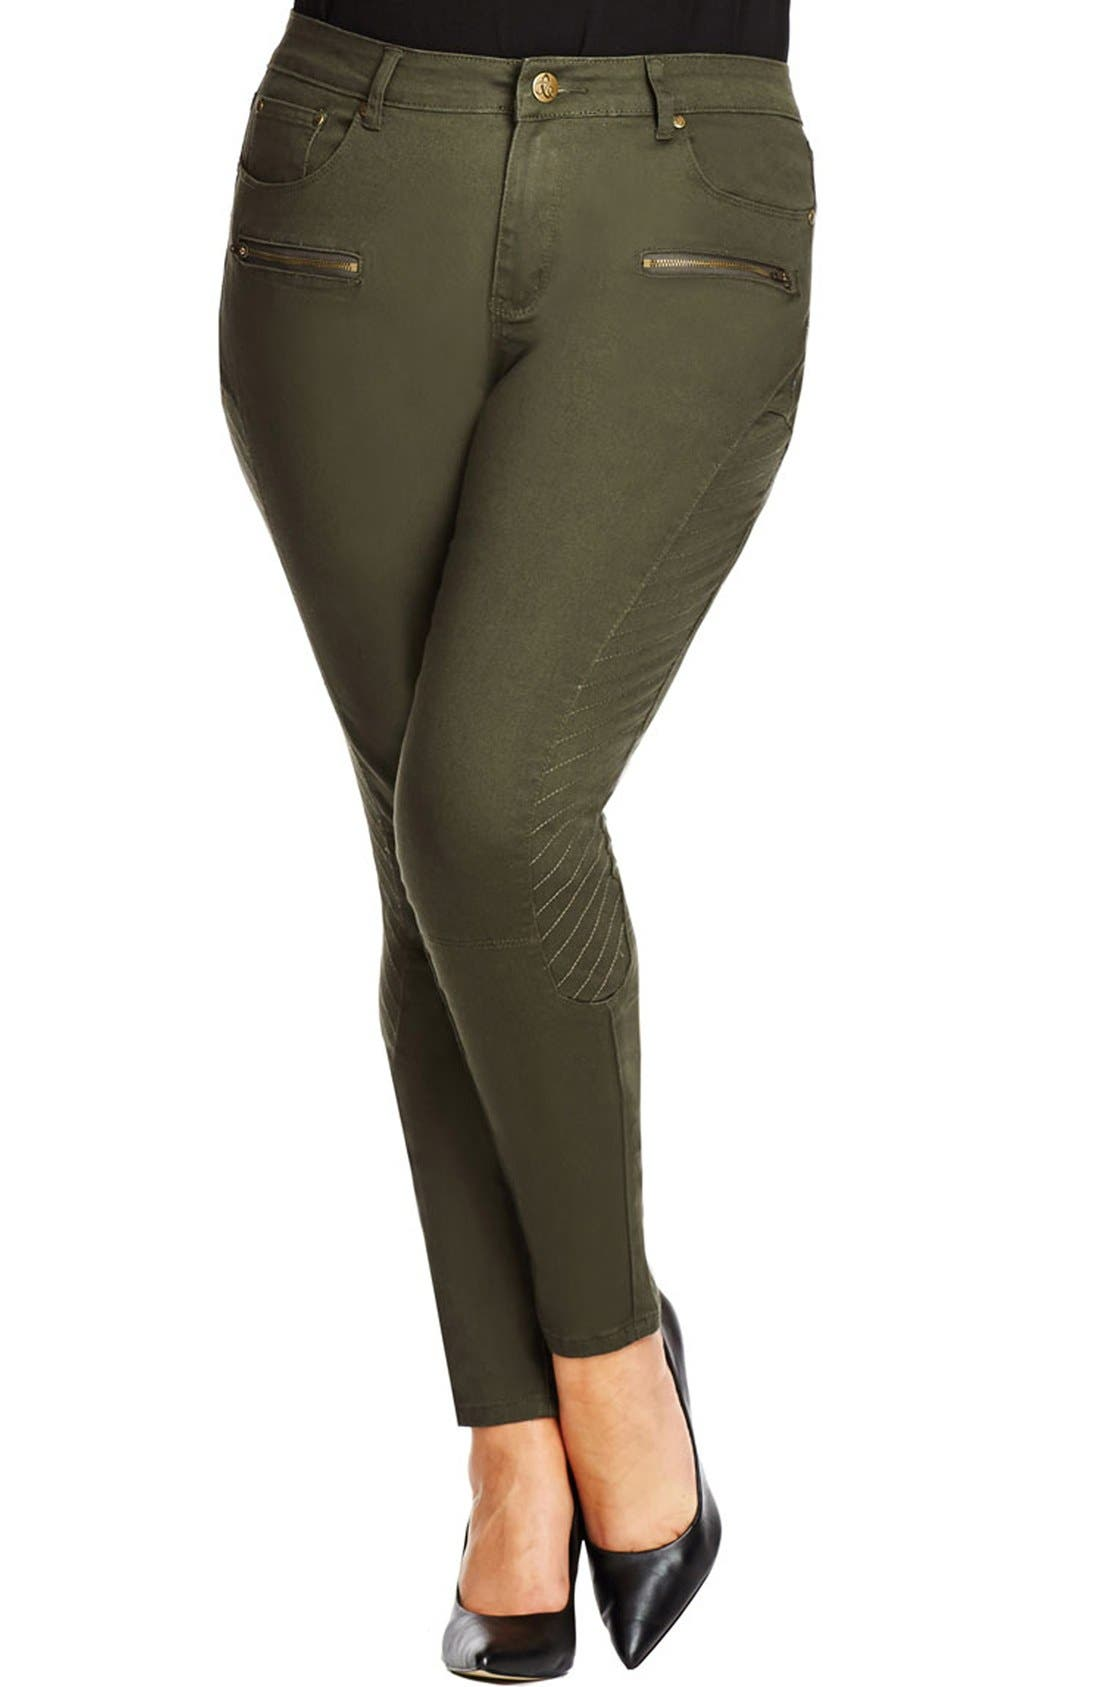 Main Image - City Chic 'Commando' Khaki Pants (Plus Size)